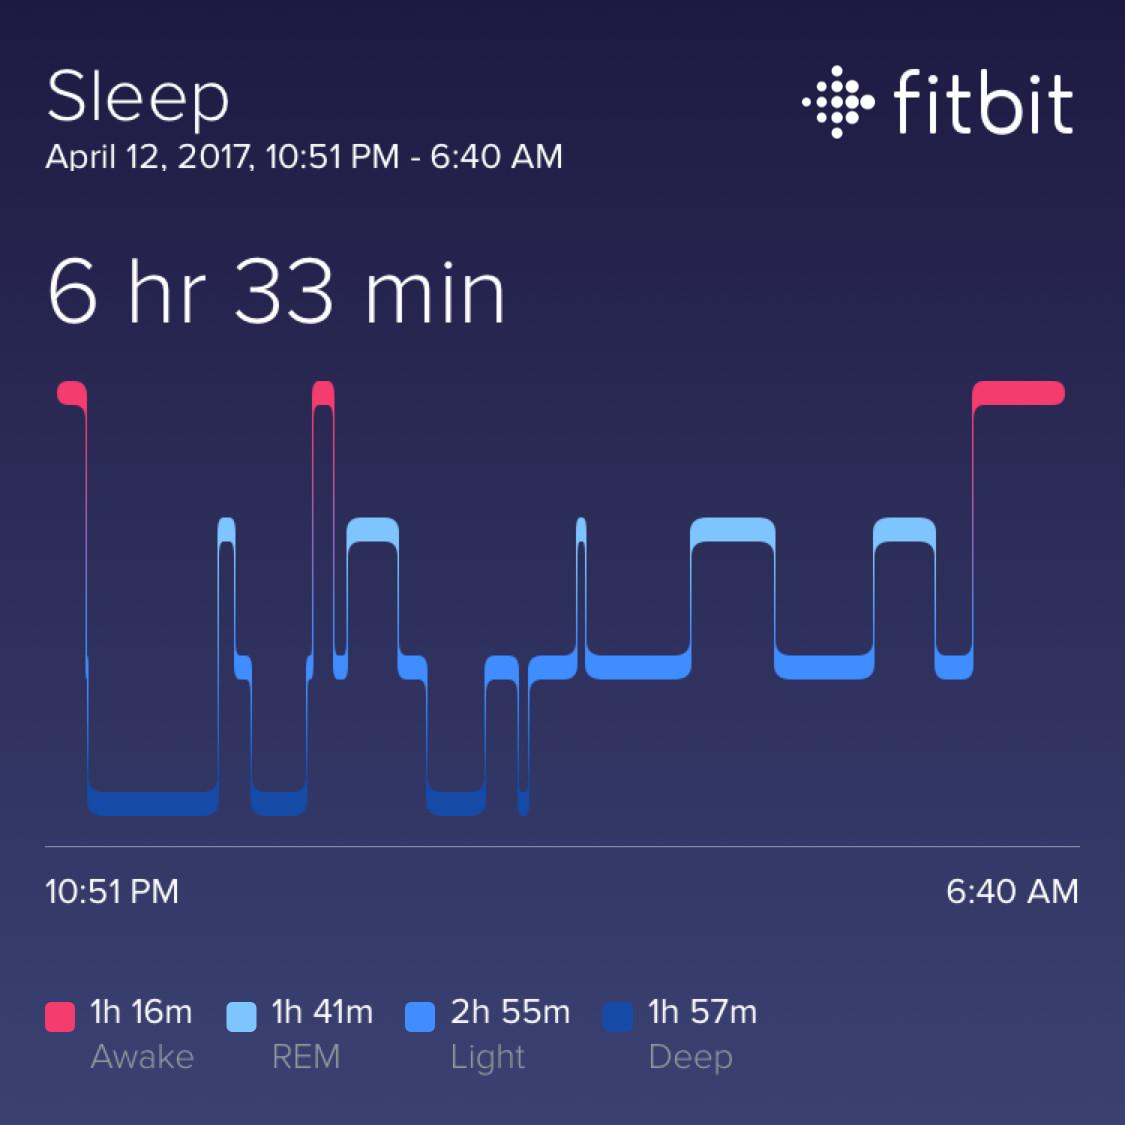 Will Fitbits Sleep Apnea Tracking Actually Work The Verge Garmin Quest Wiring Diagram Lauren Goode